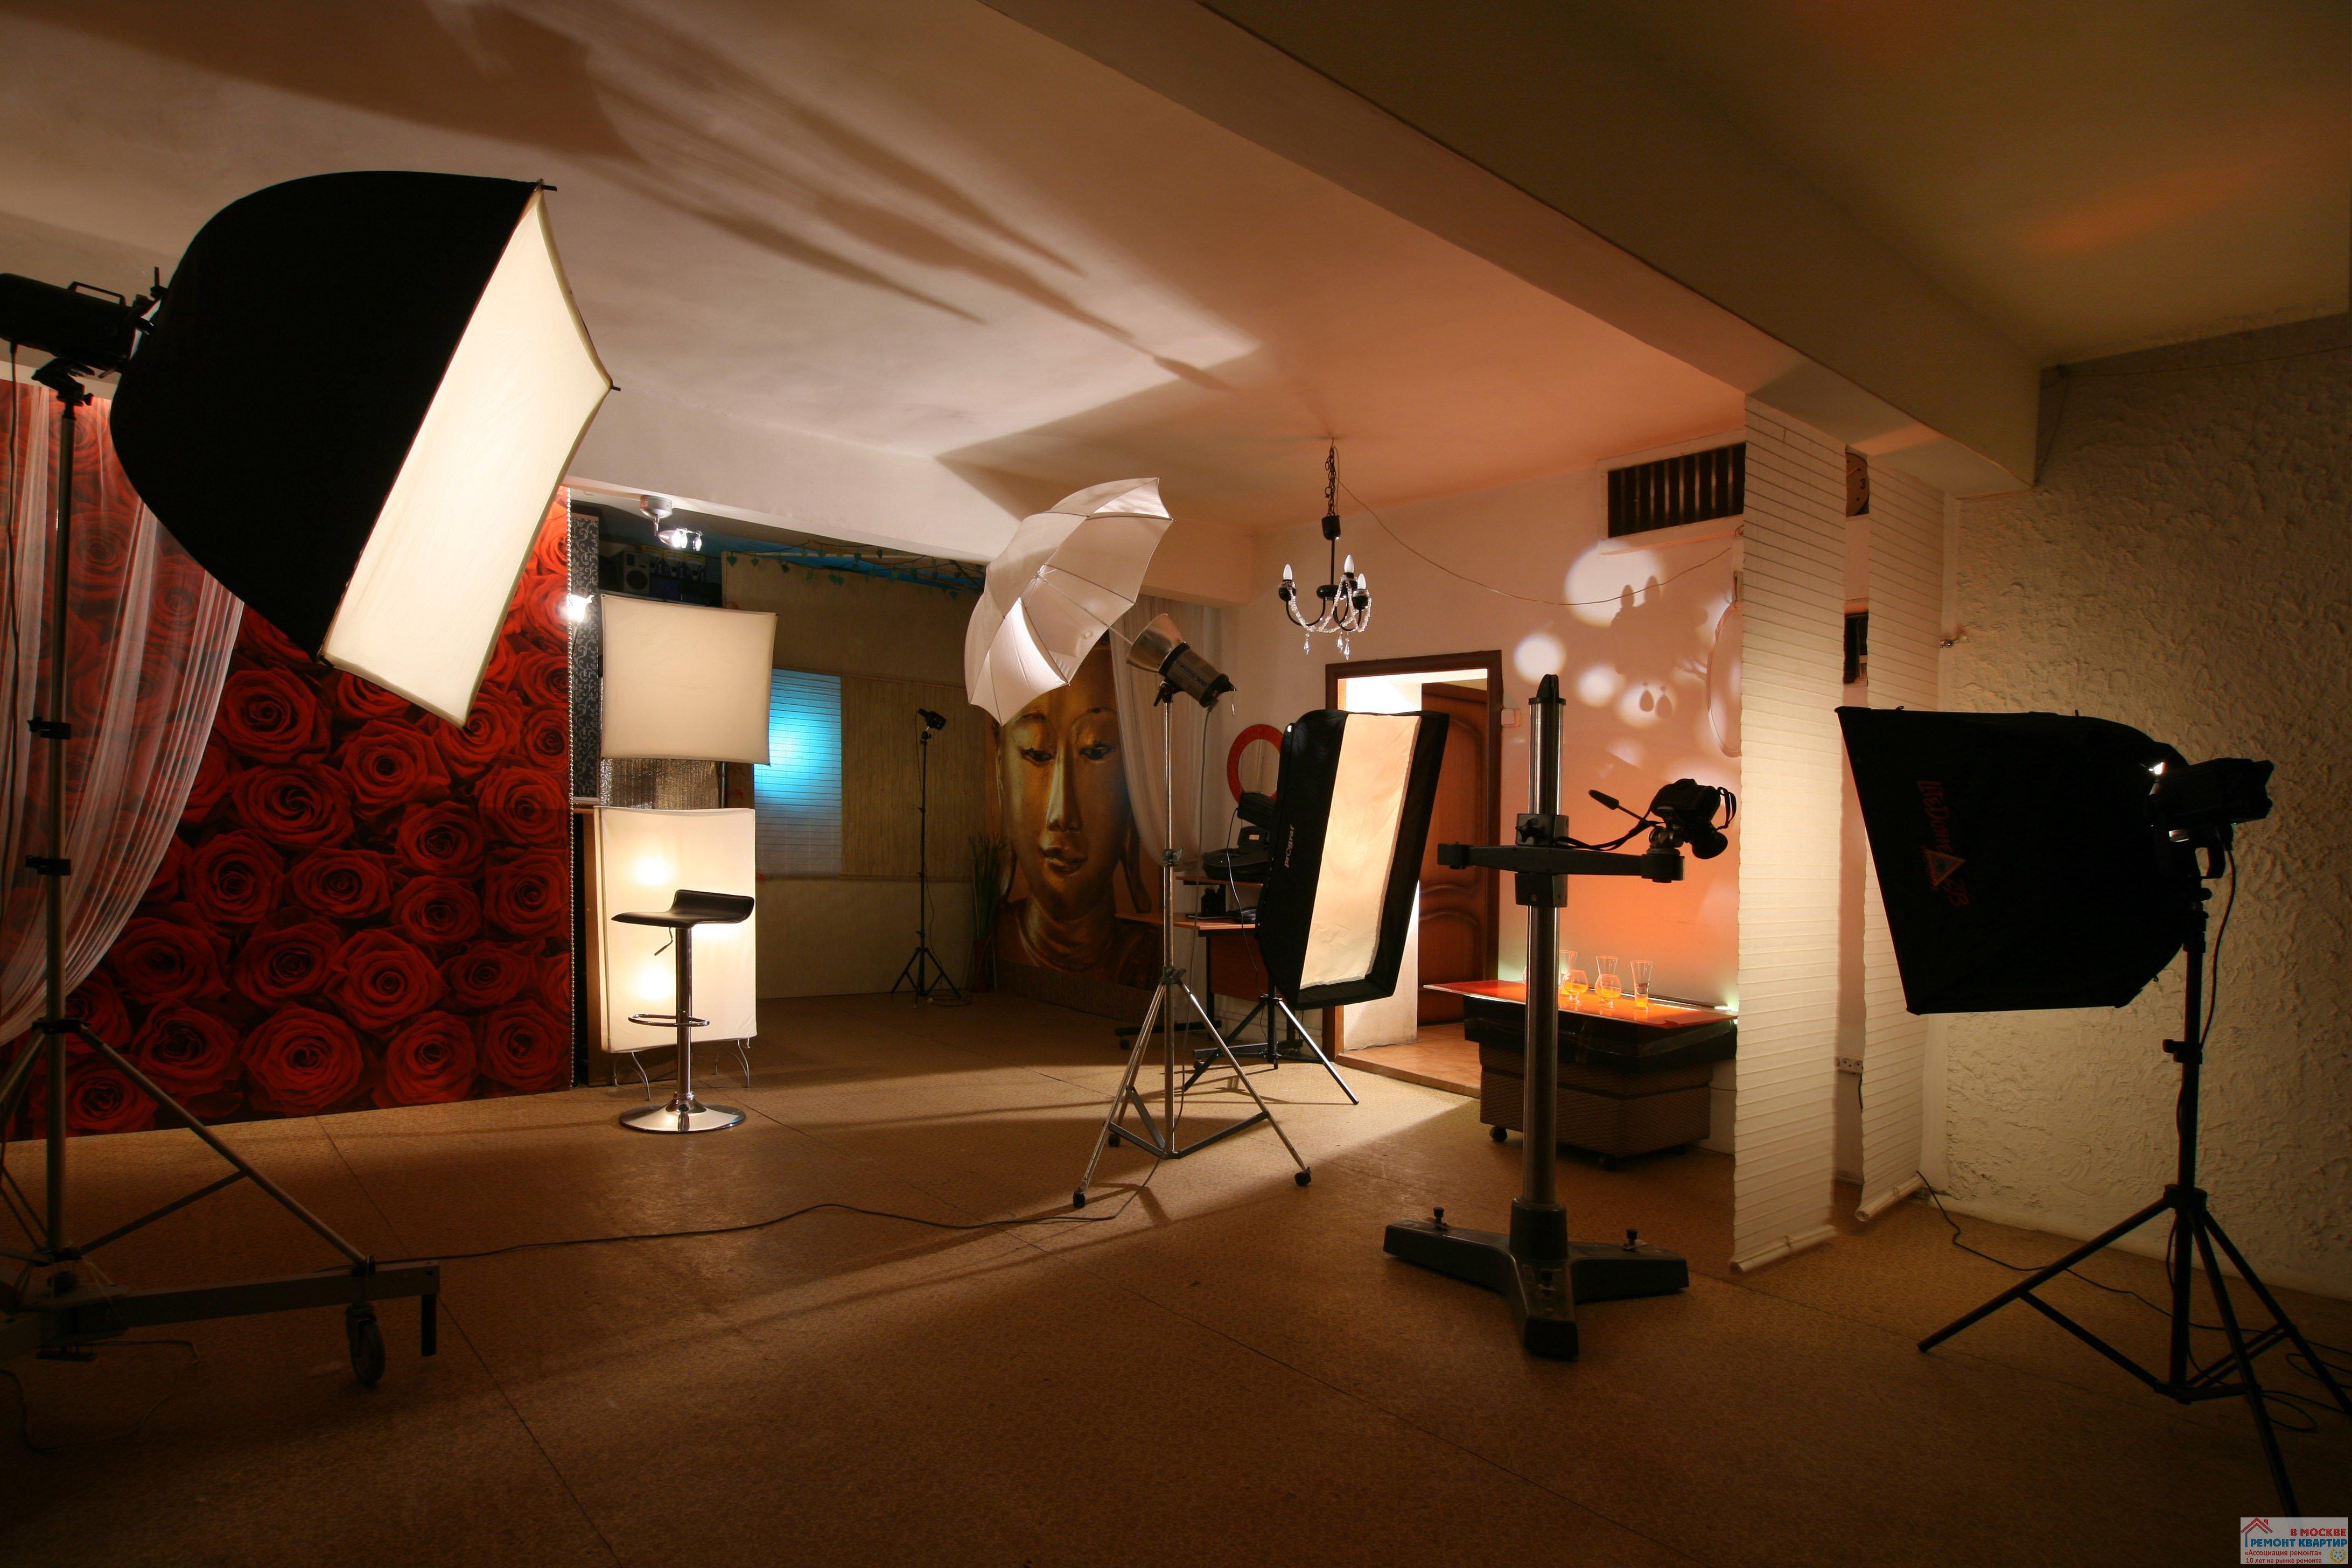 CowboyStudio Photography Table Top Photo Studio Lighting Good name for photography studio